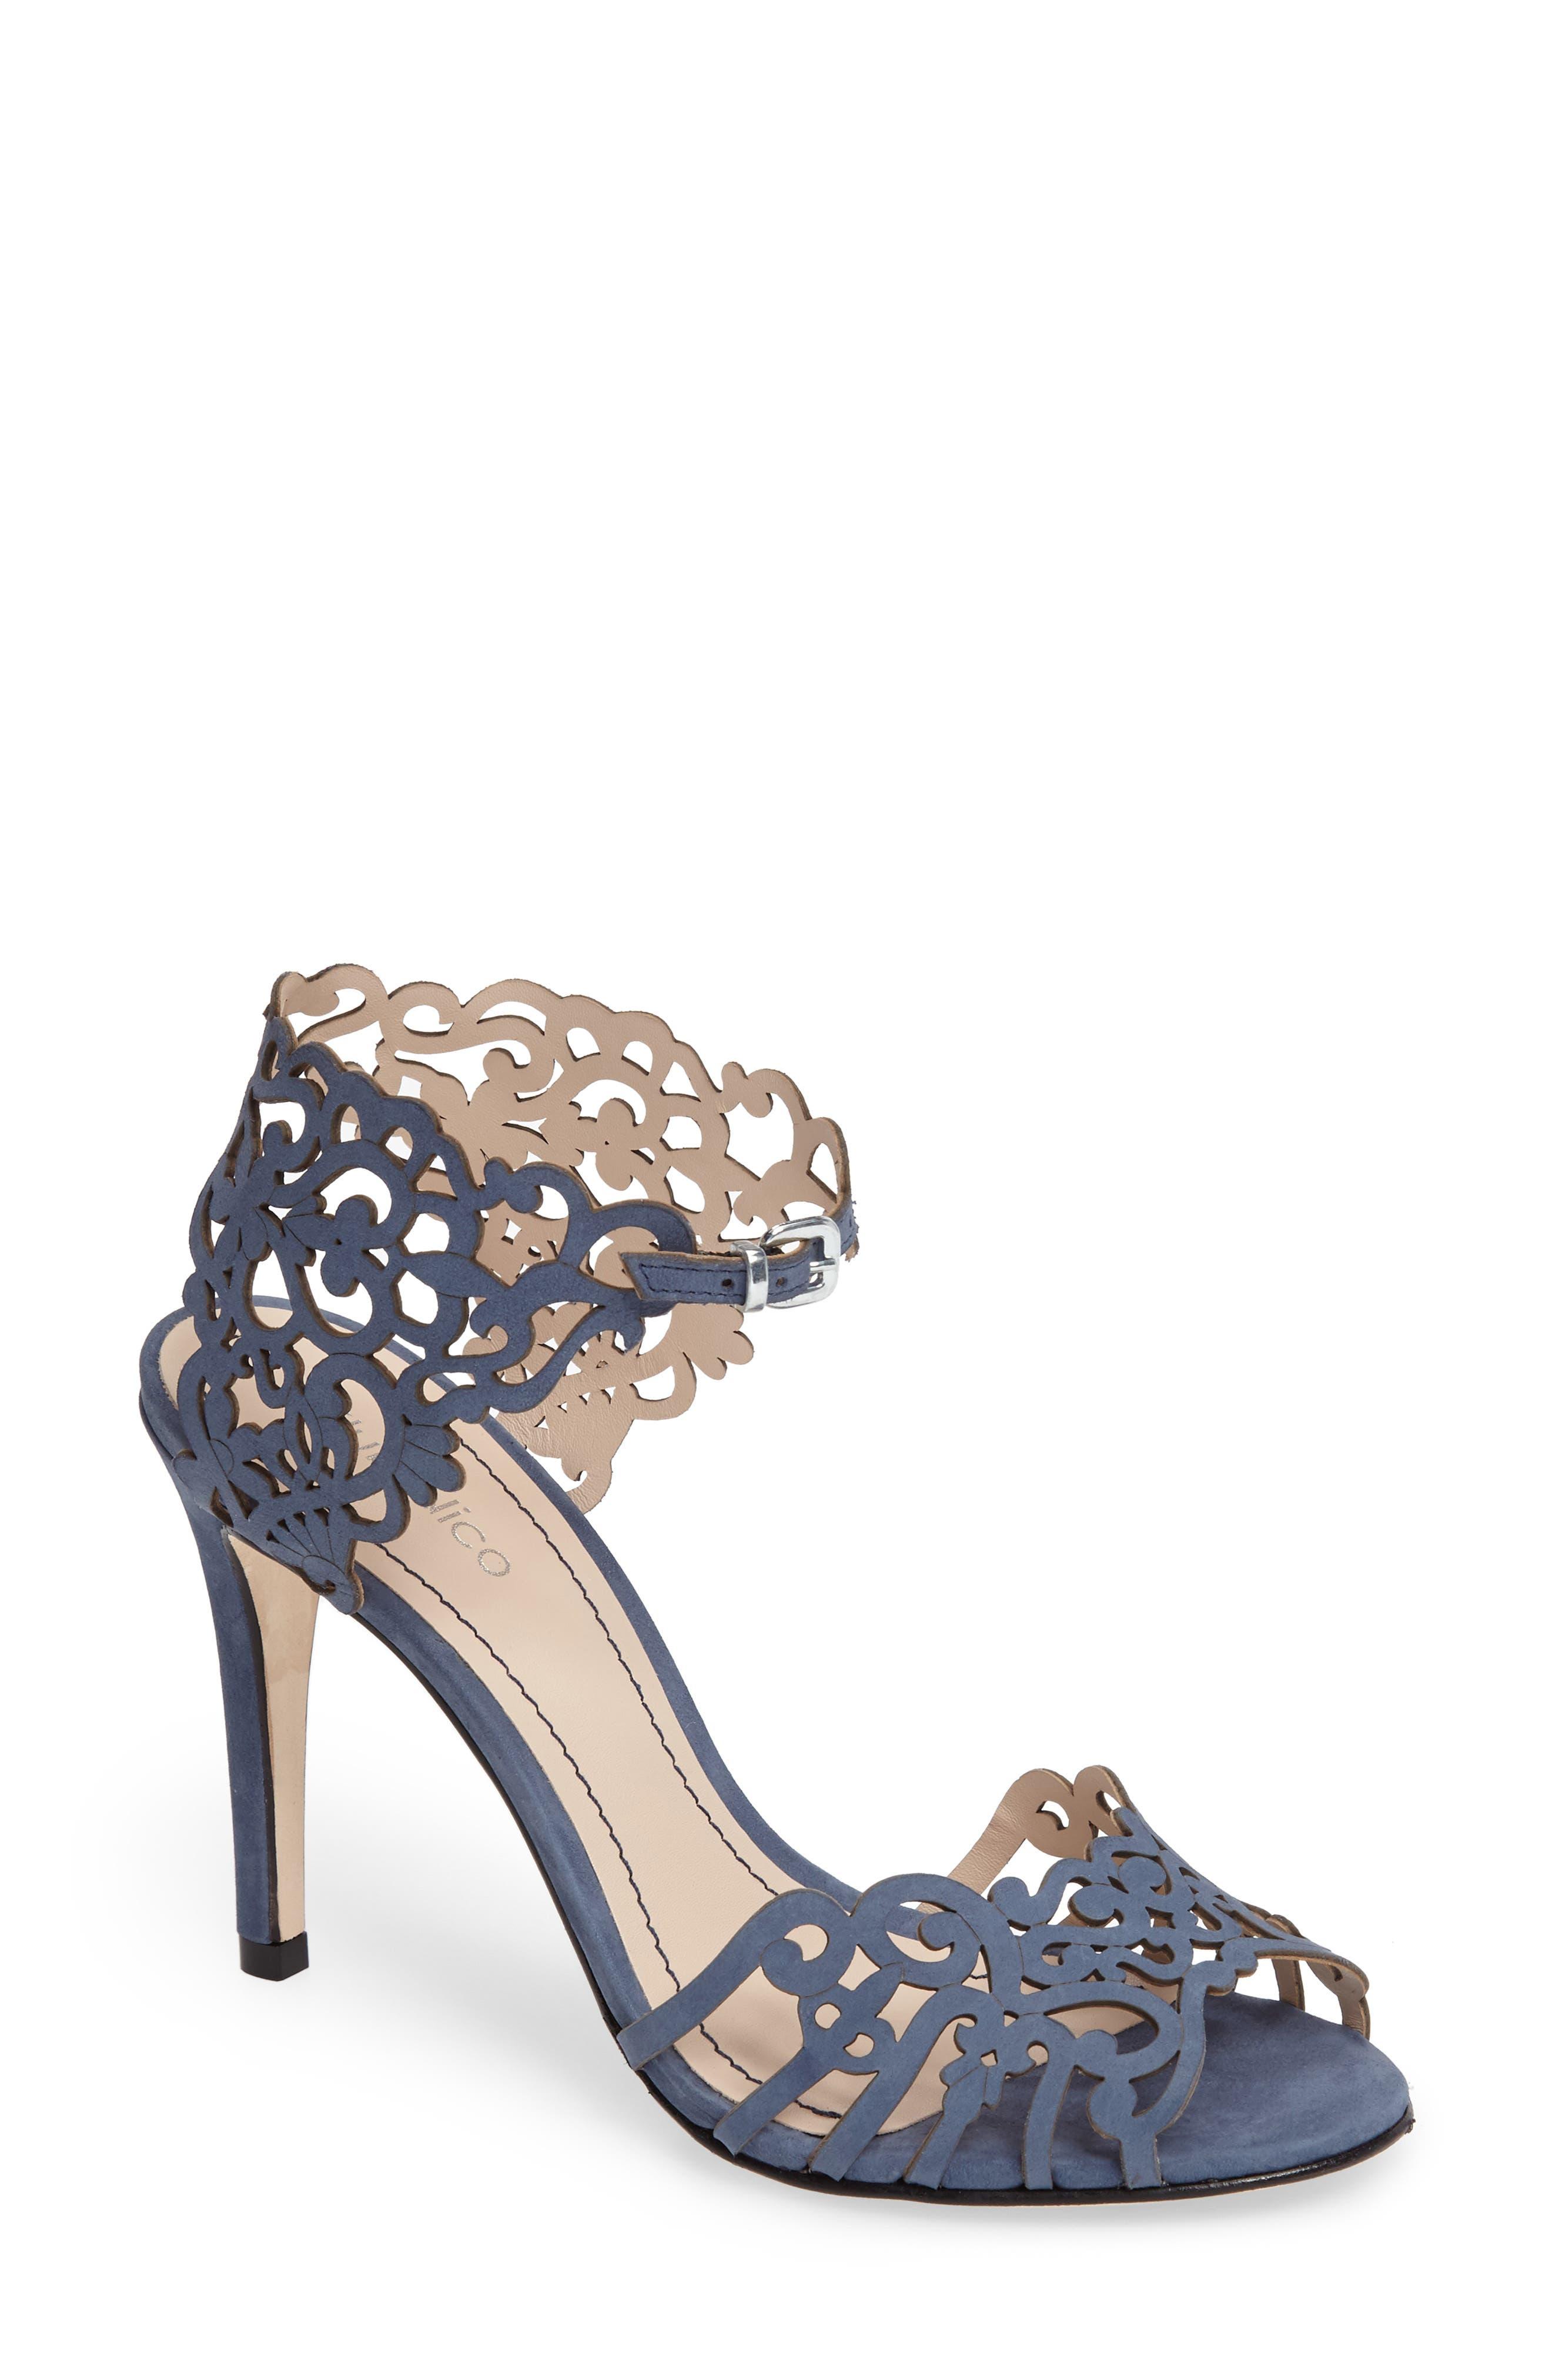 Alternate Image 1 Selected - Klub Nico 'Moxie' Laser Cutout Sandal (Women)